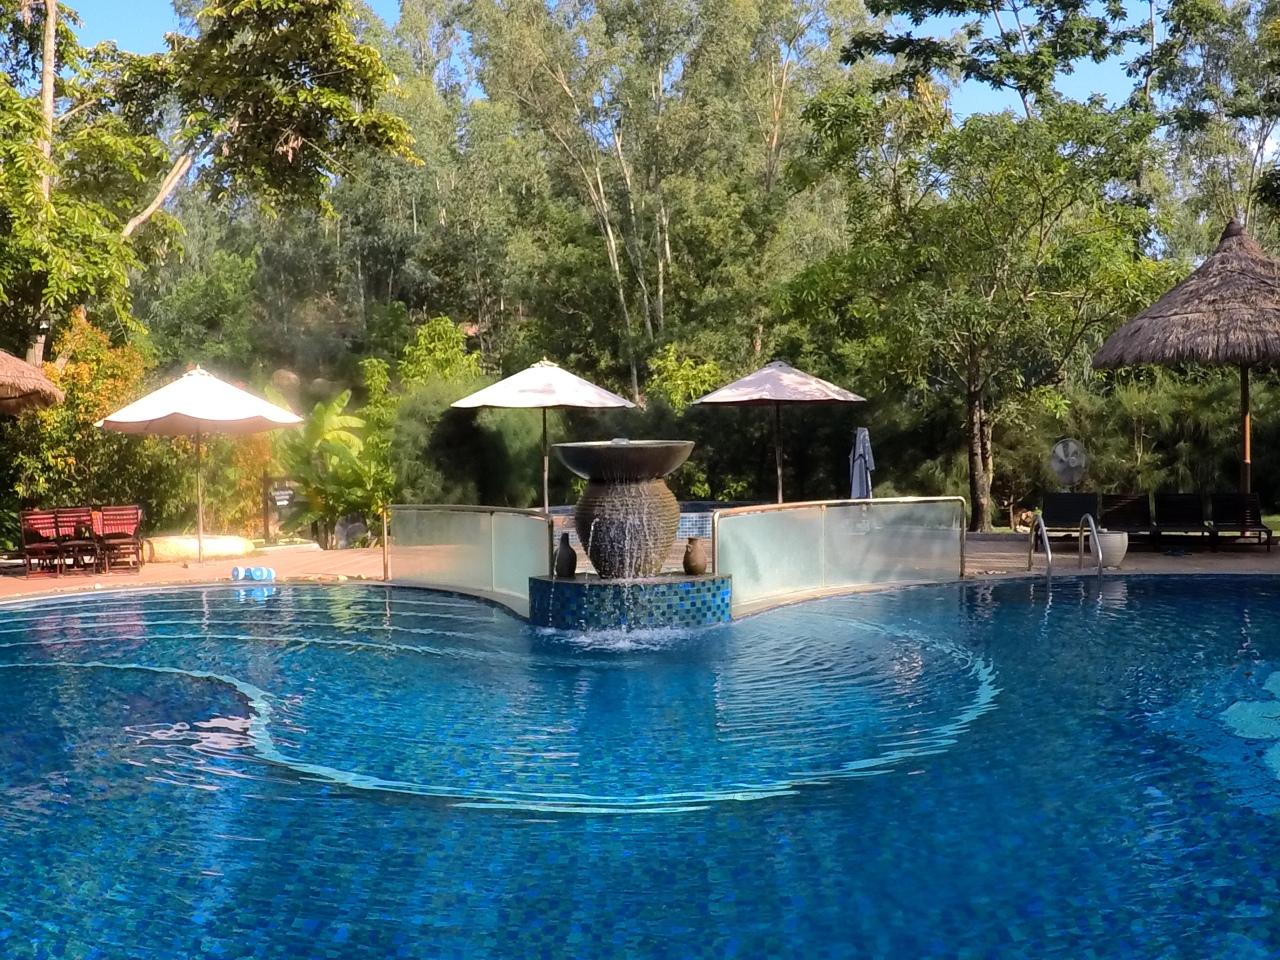 Nah Trang spa pool